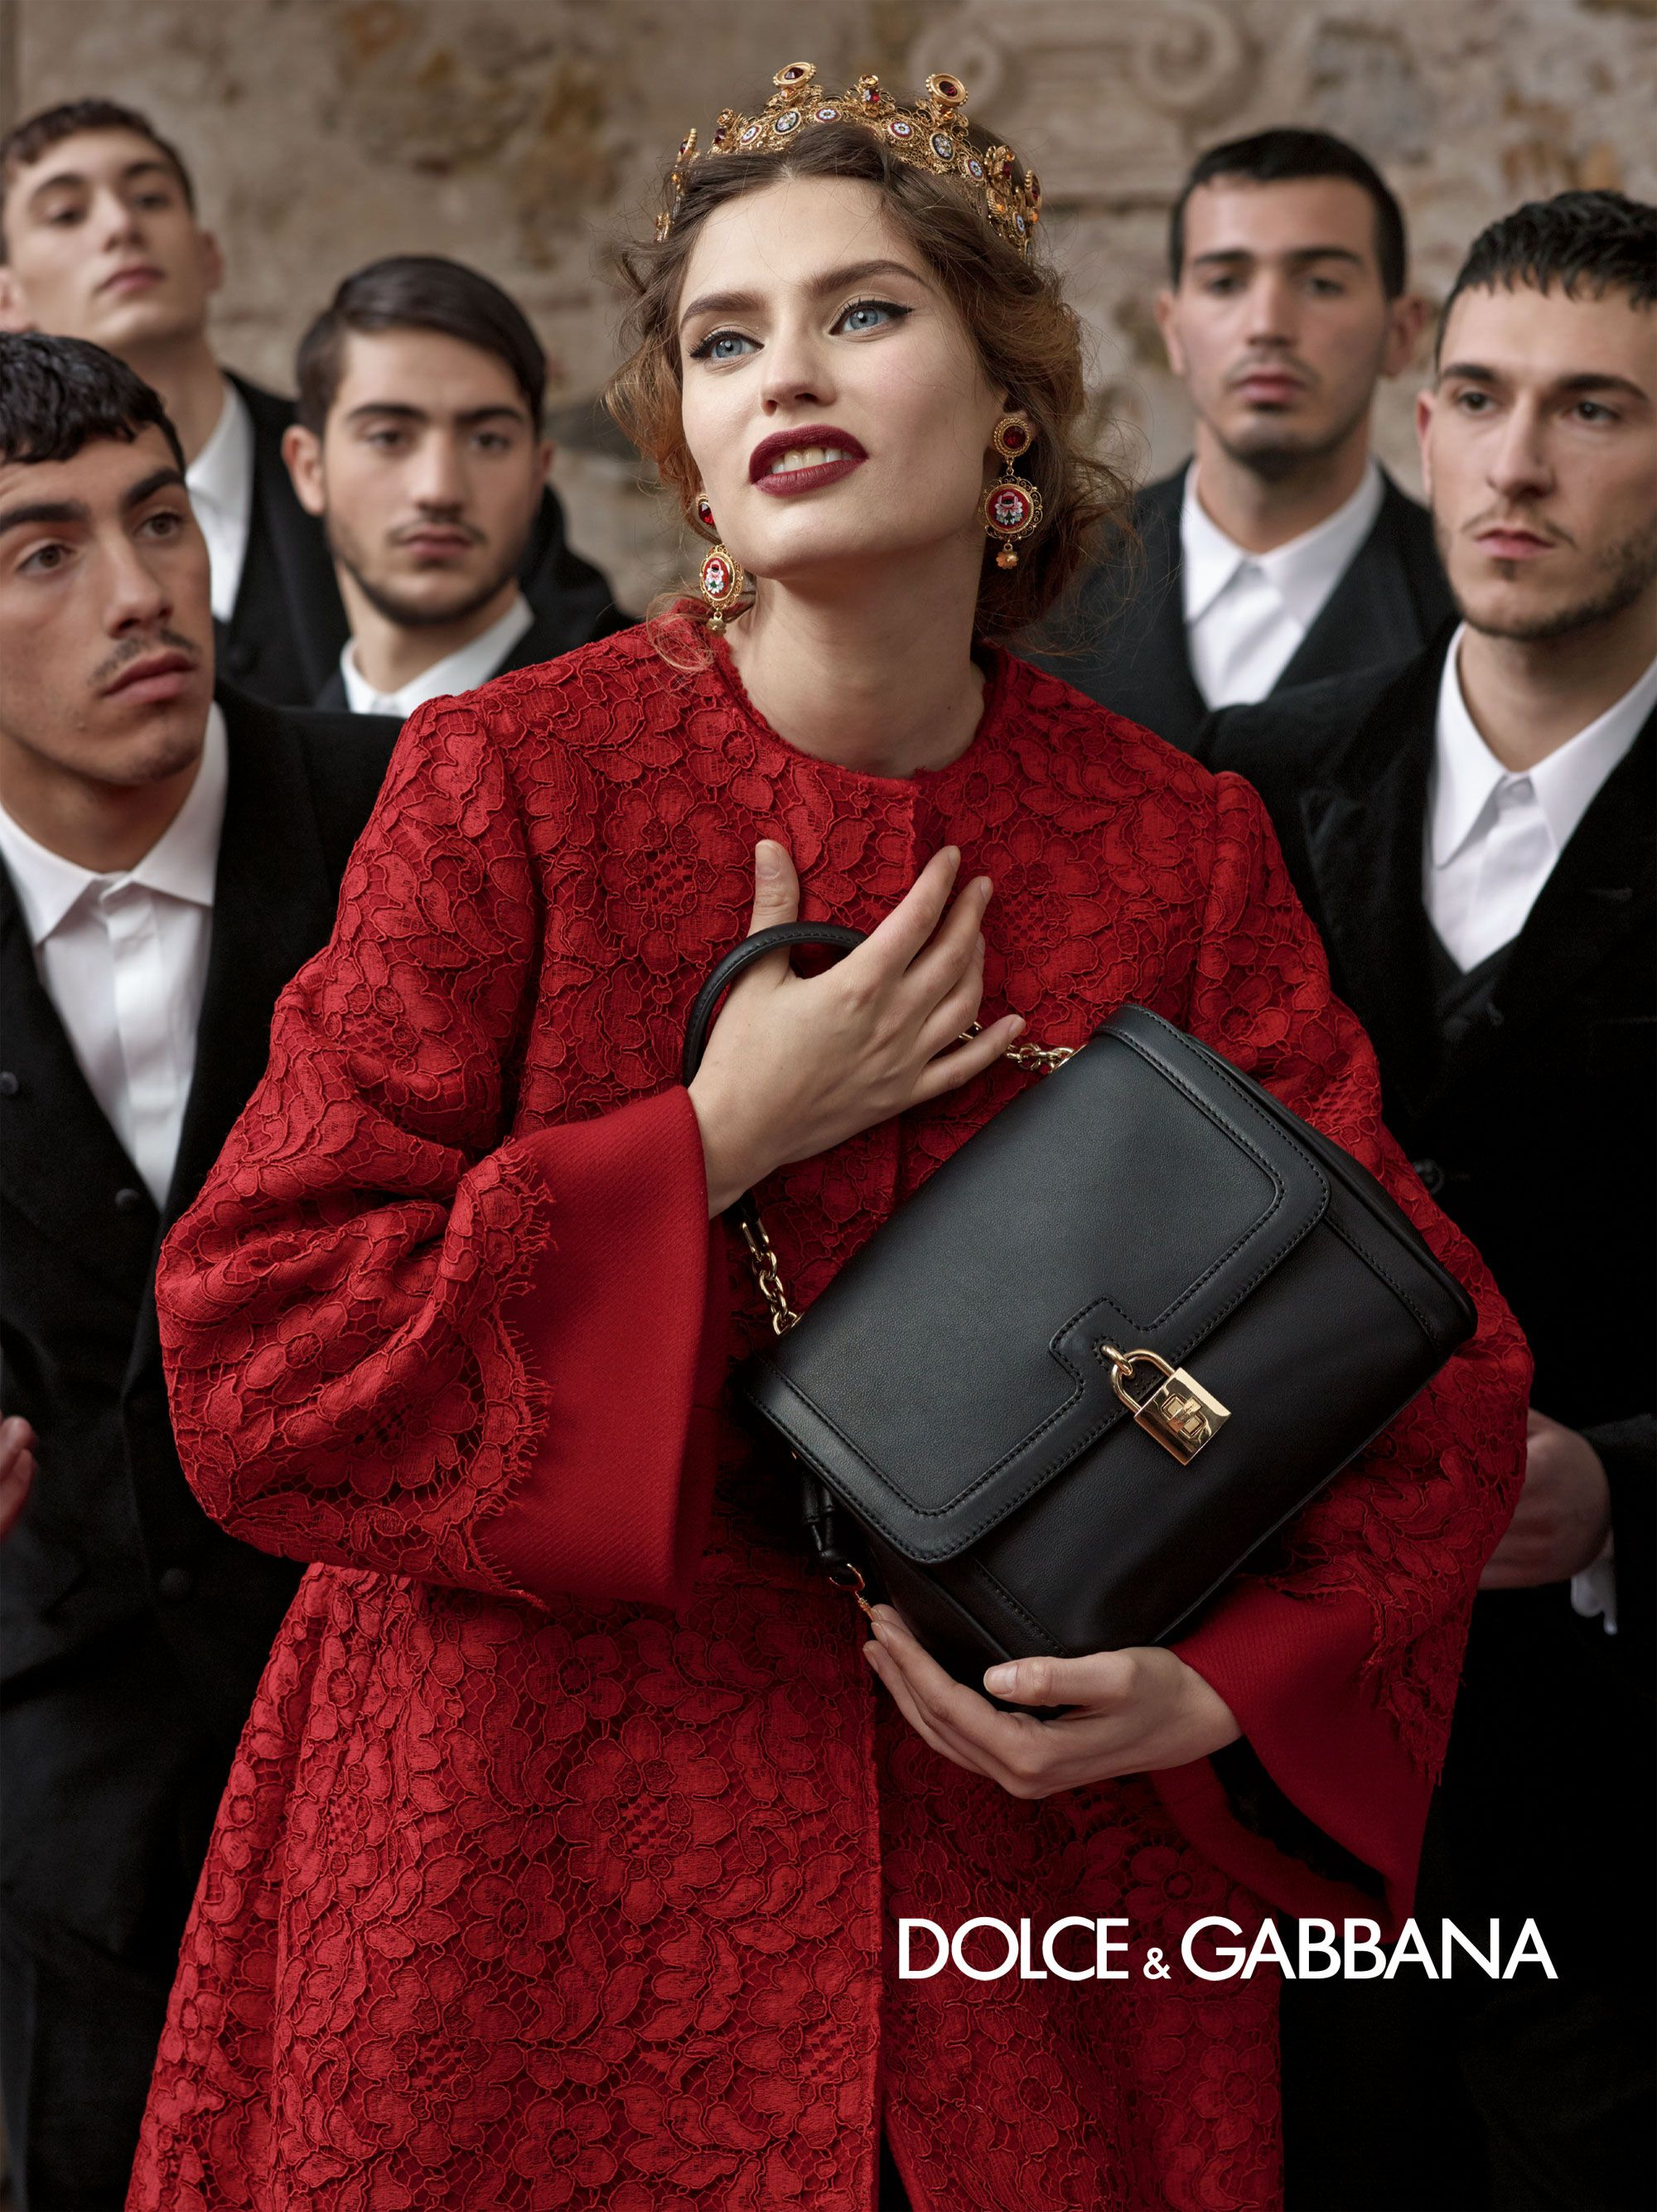 89f324439dd4 Dolce   Gabbana – Womenswear Advertising Campaign - Fall Winter 2014 ...